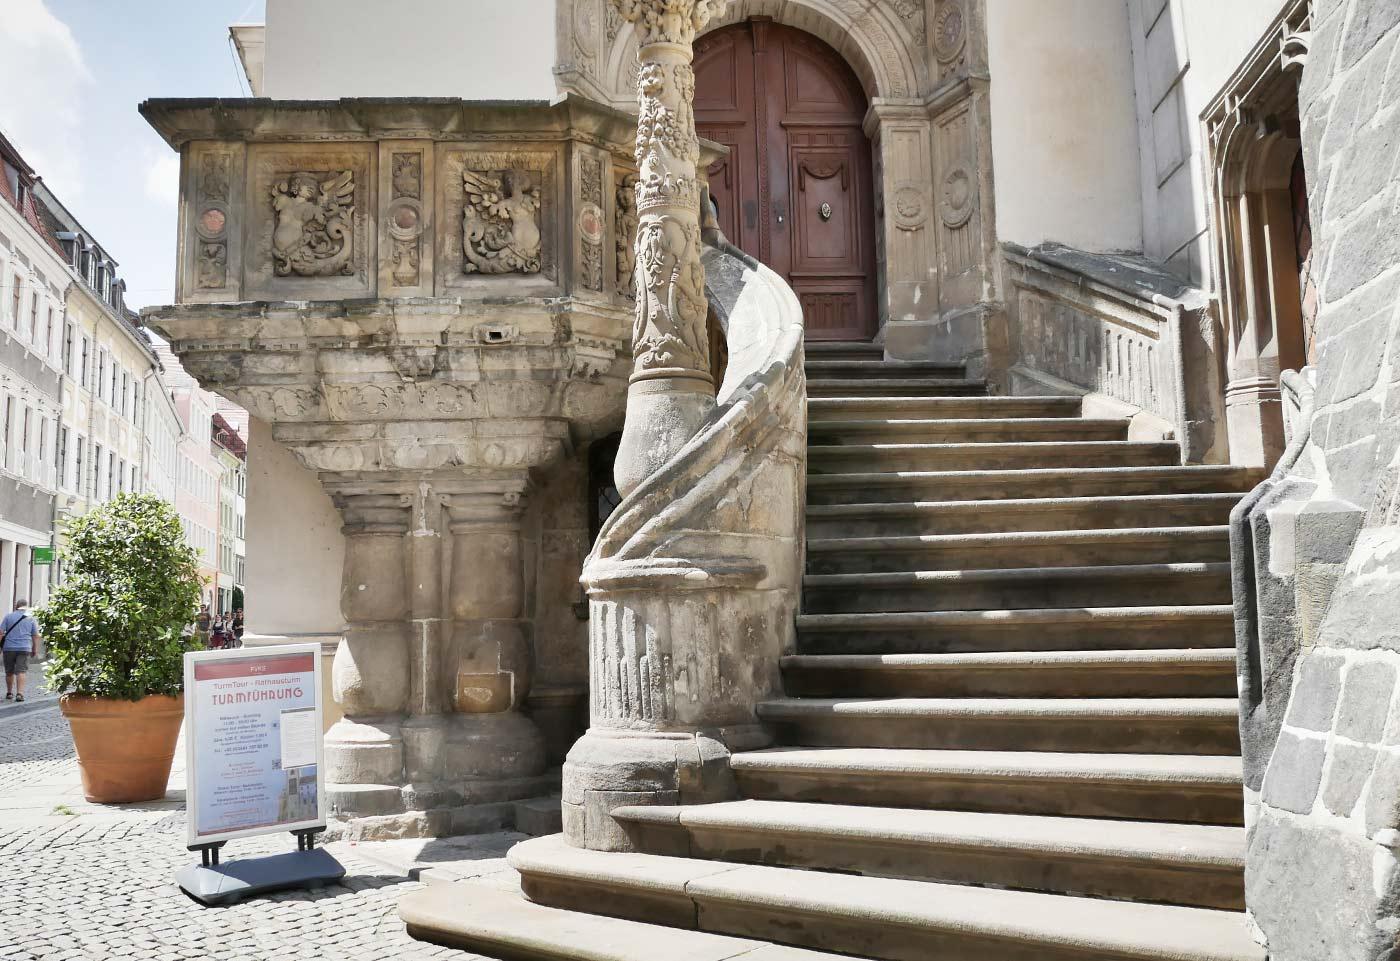 Rathaustreppe in Görlitz